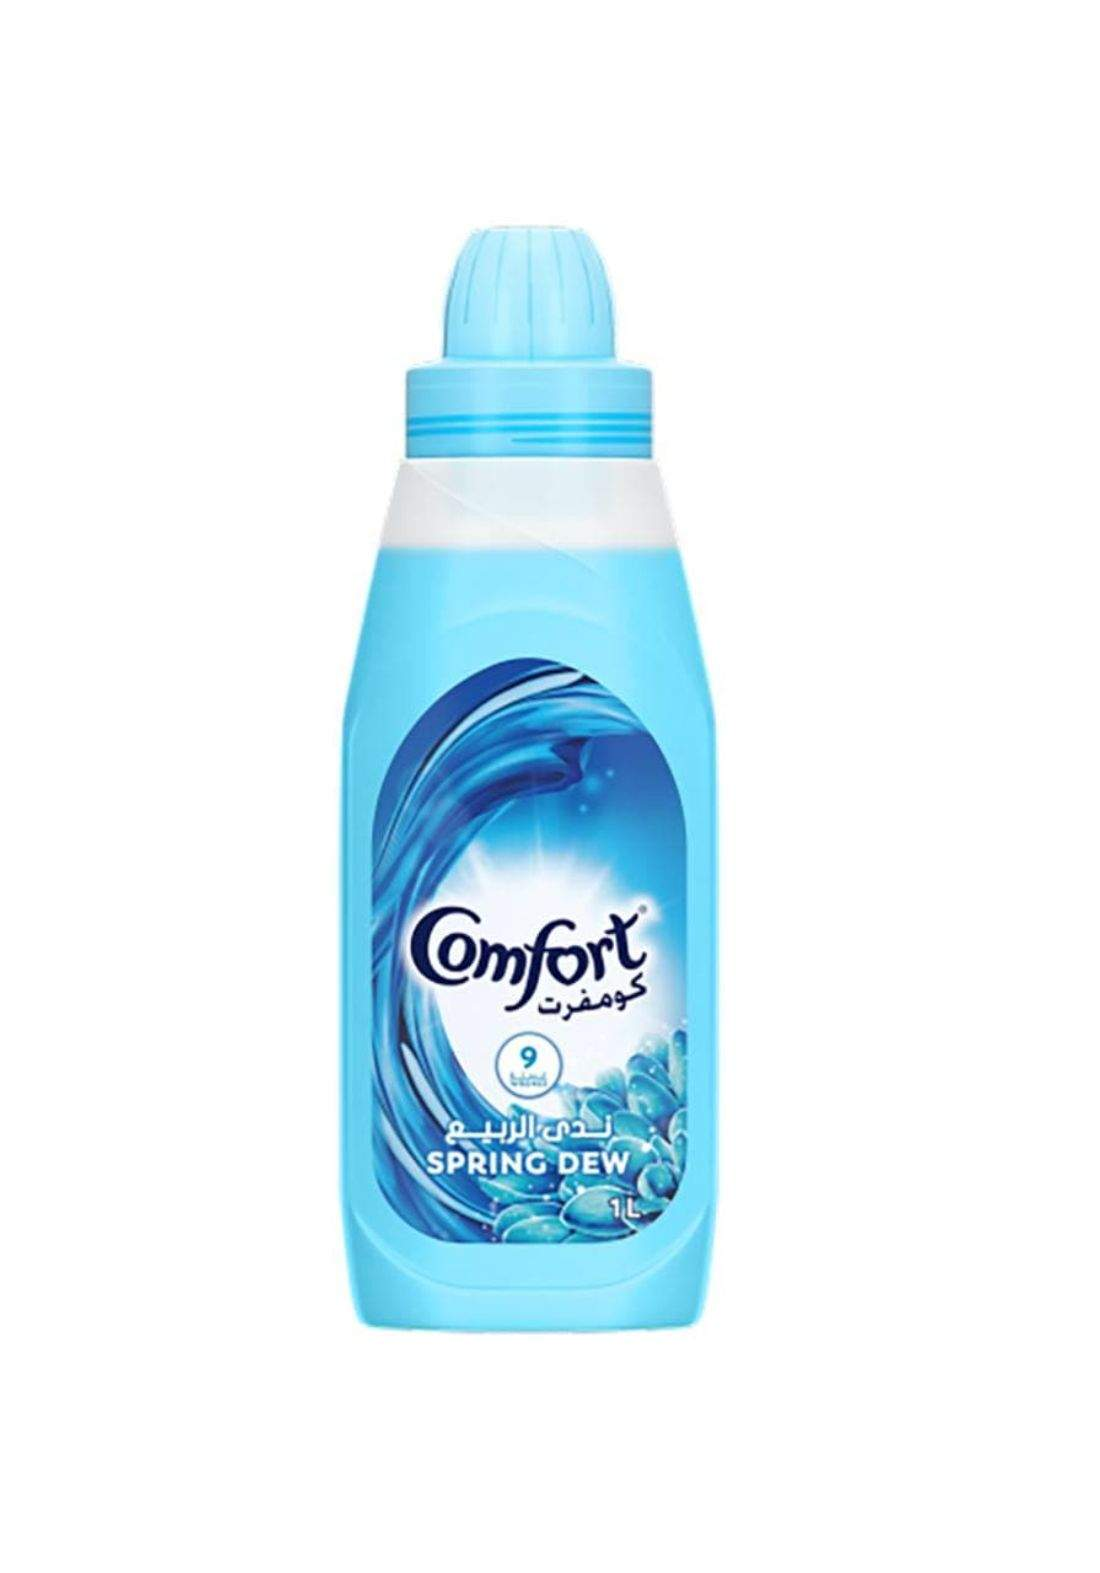 comfort fabric softener spring dew 1 L كومفورت منعم الملابس ندى الربيع  1 لتر